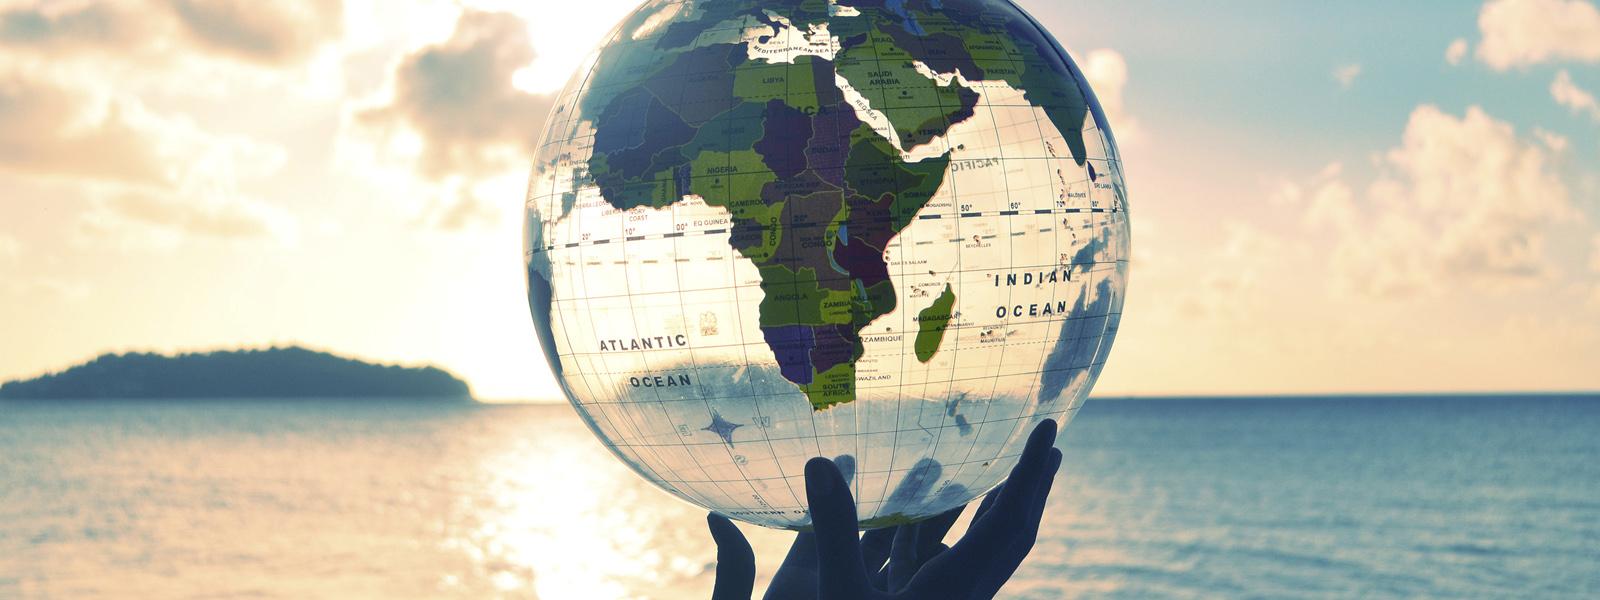 ingredientes-carino-sustentabilidad-global